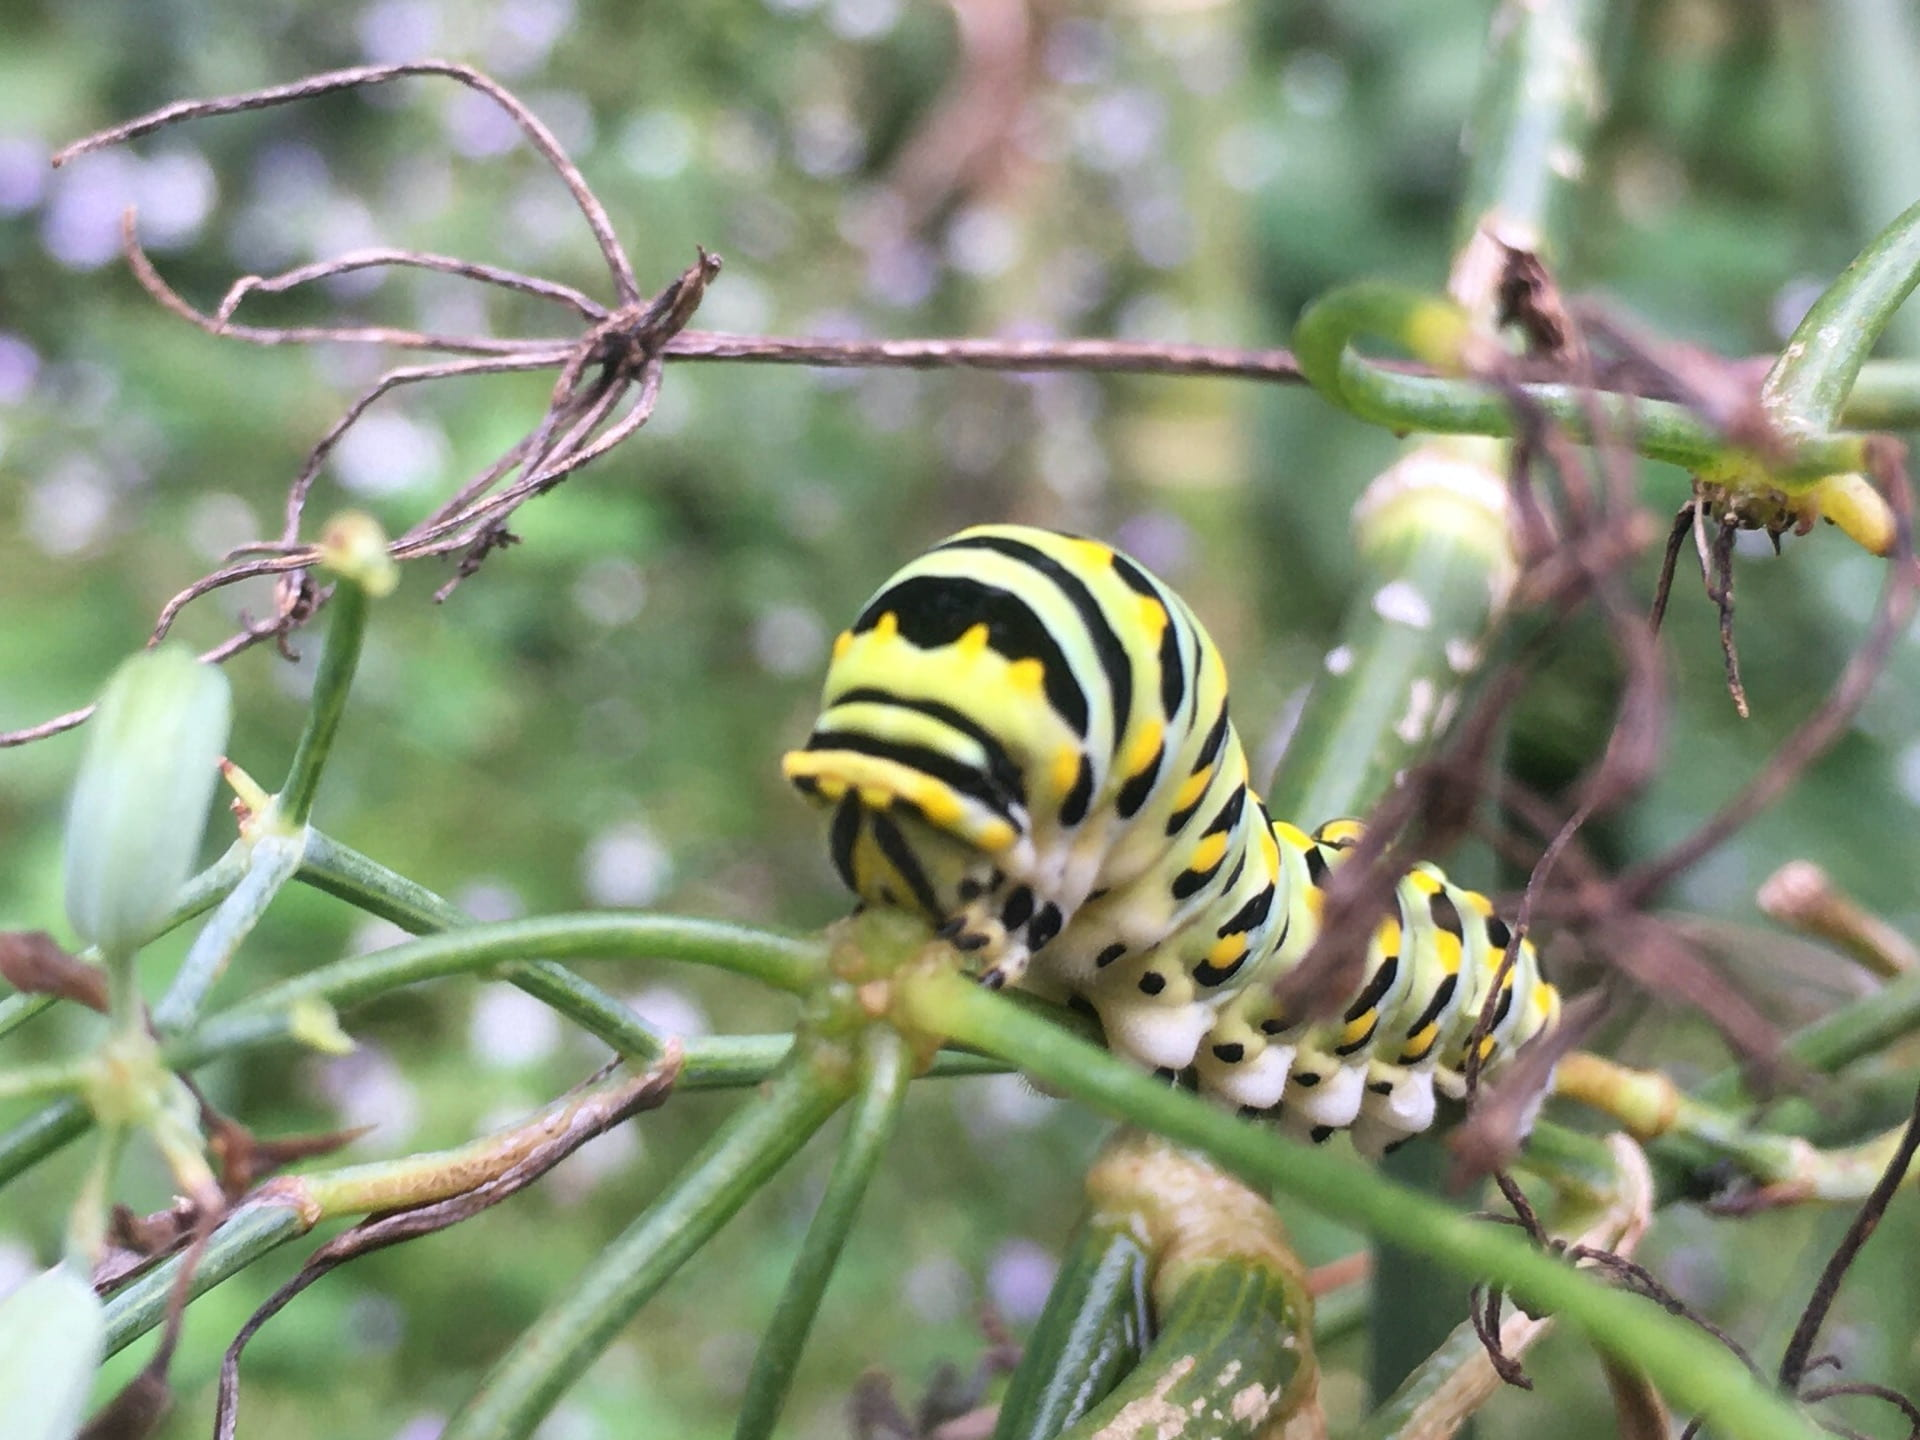 An eastern black swallowtail caterpillar munches on fennel stems.